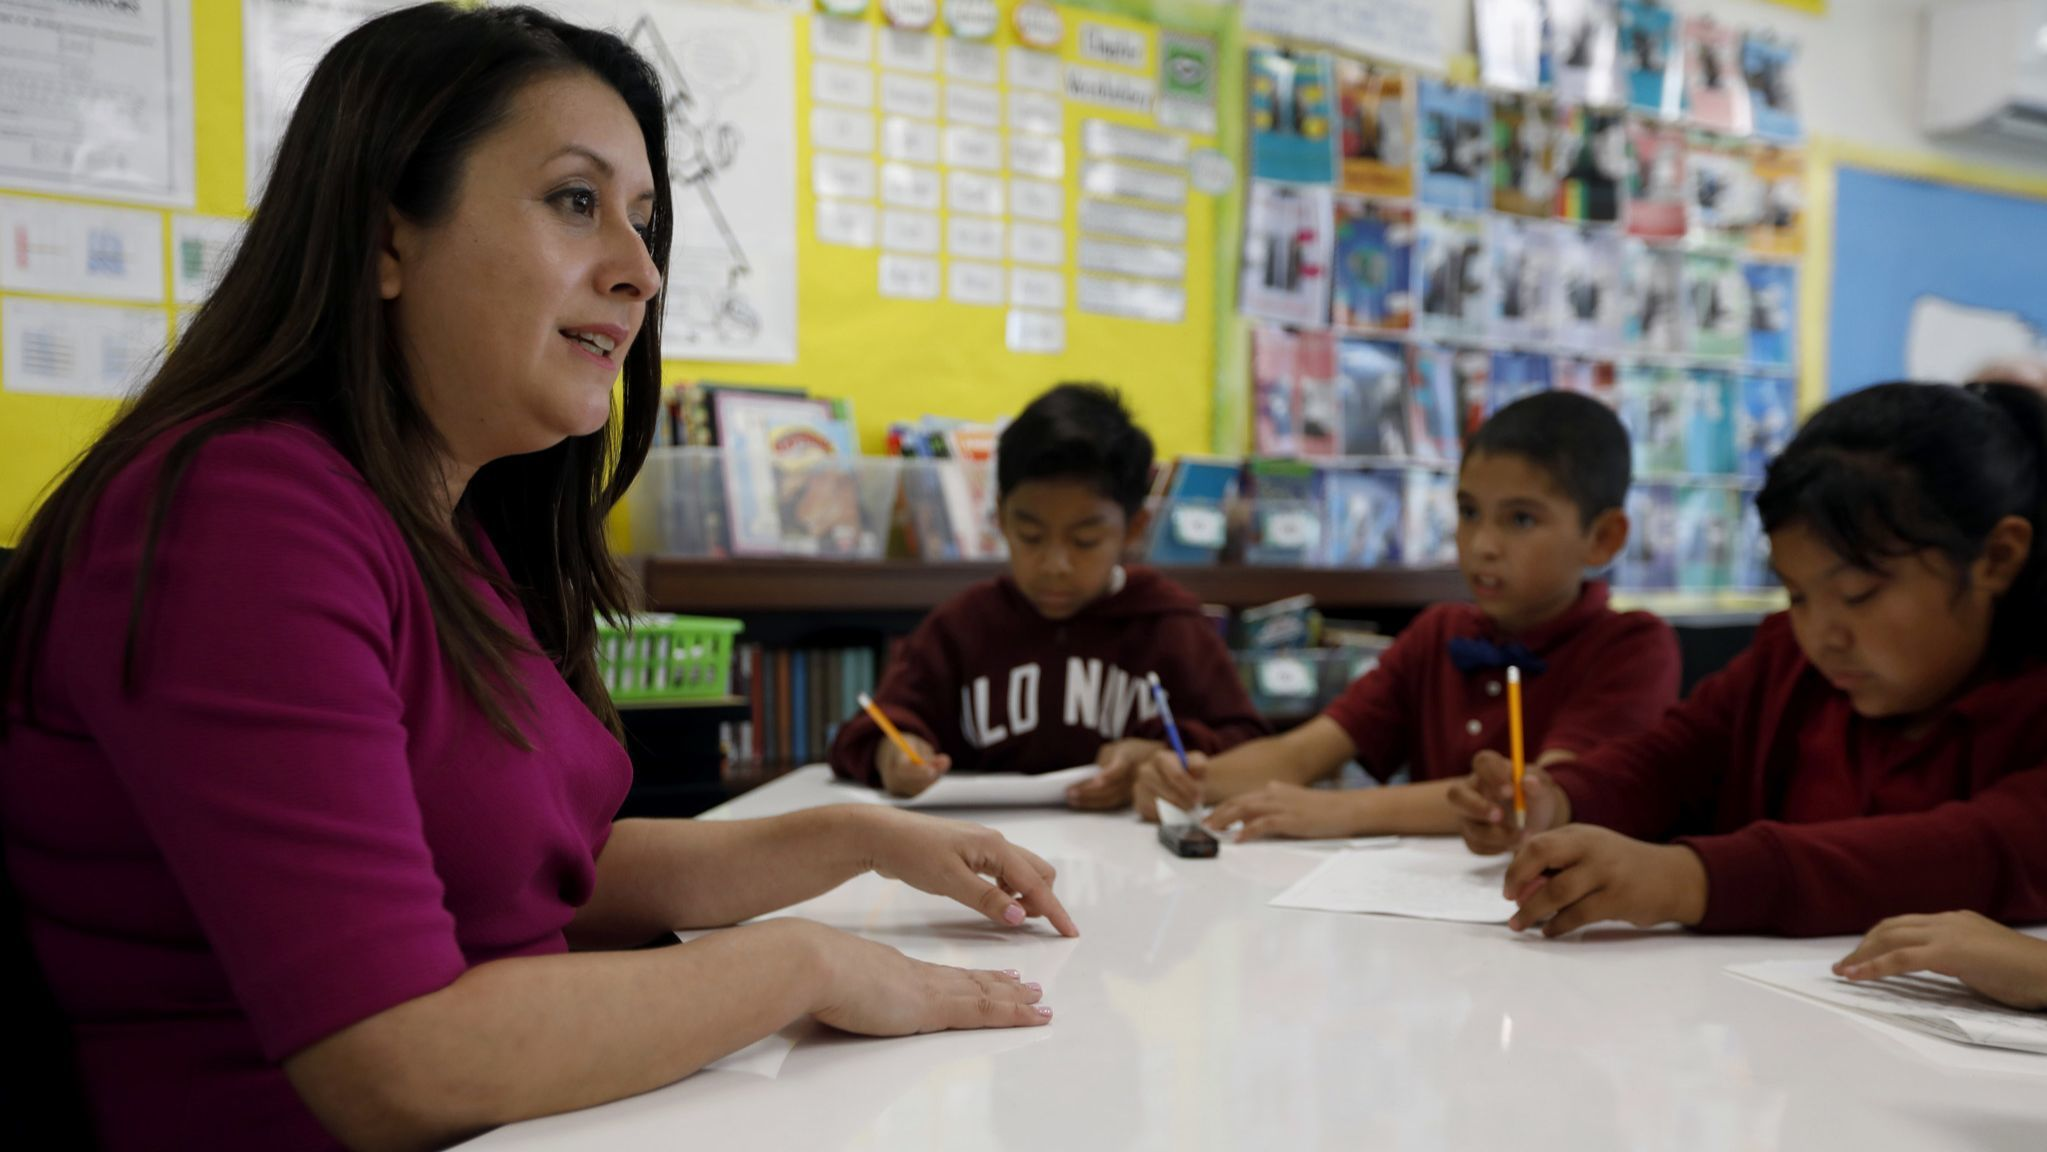 Assemblywoman Luz Rivas visits the Vaughn center